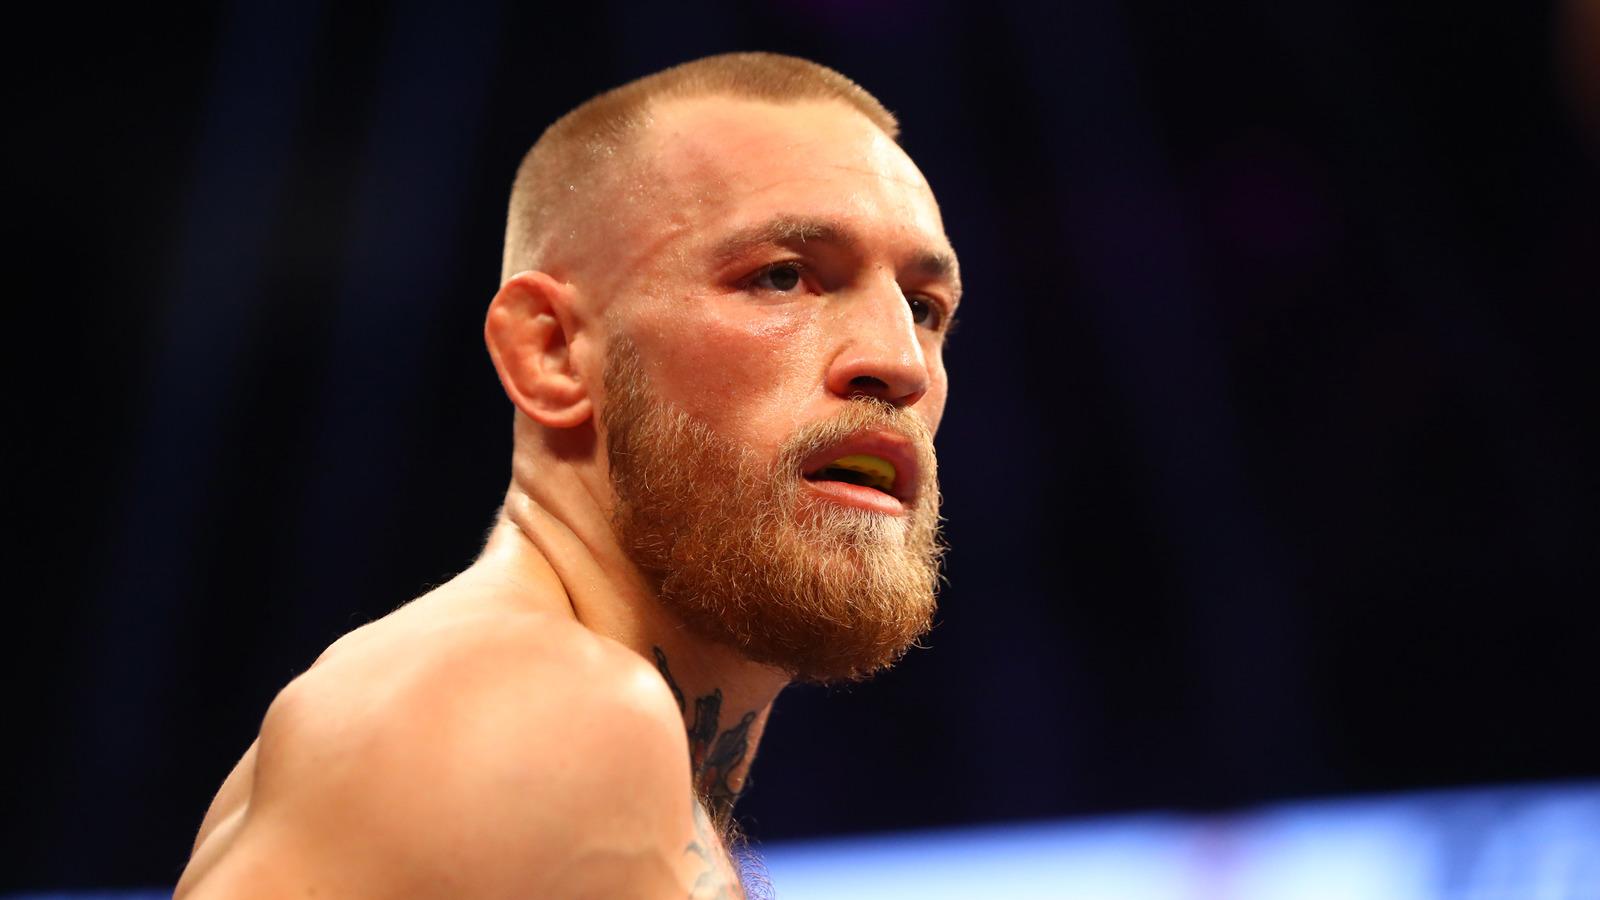 Conor McGregor in legal battle over filing of several trademarks